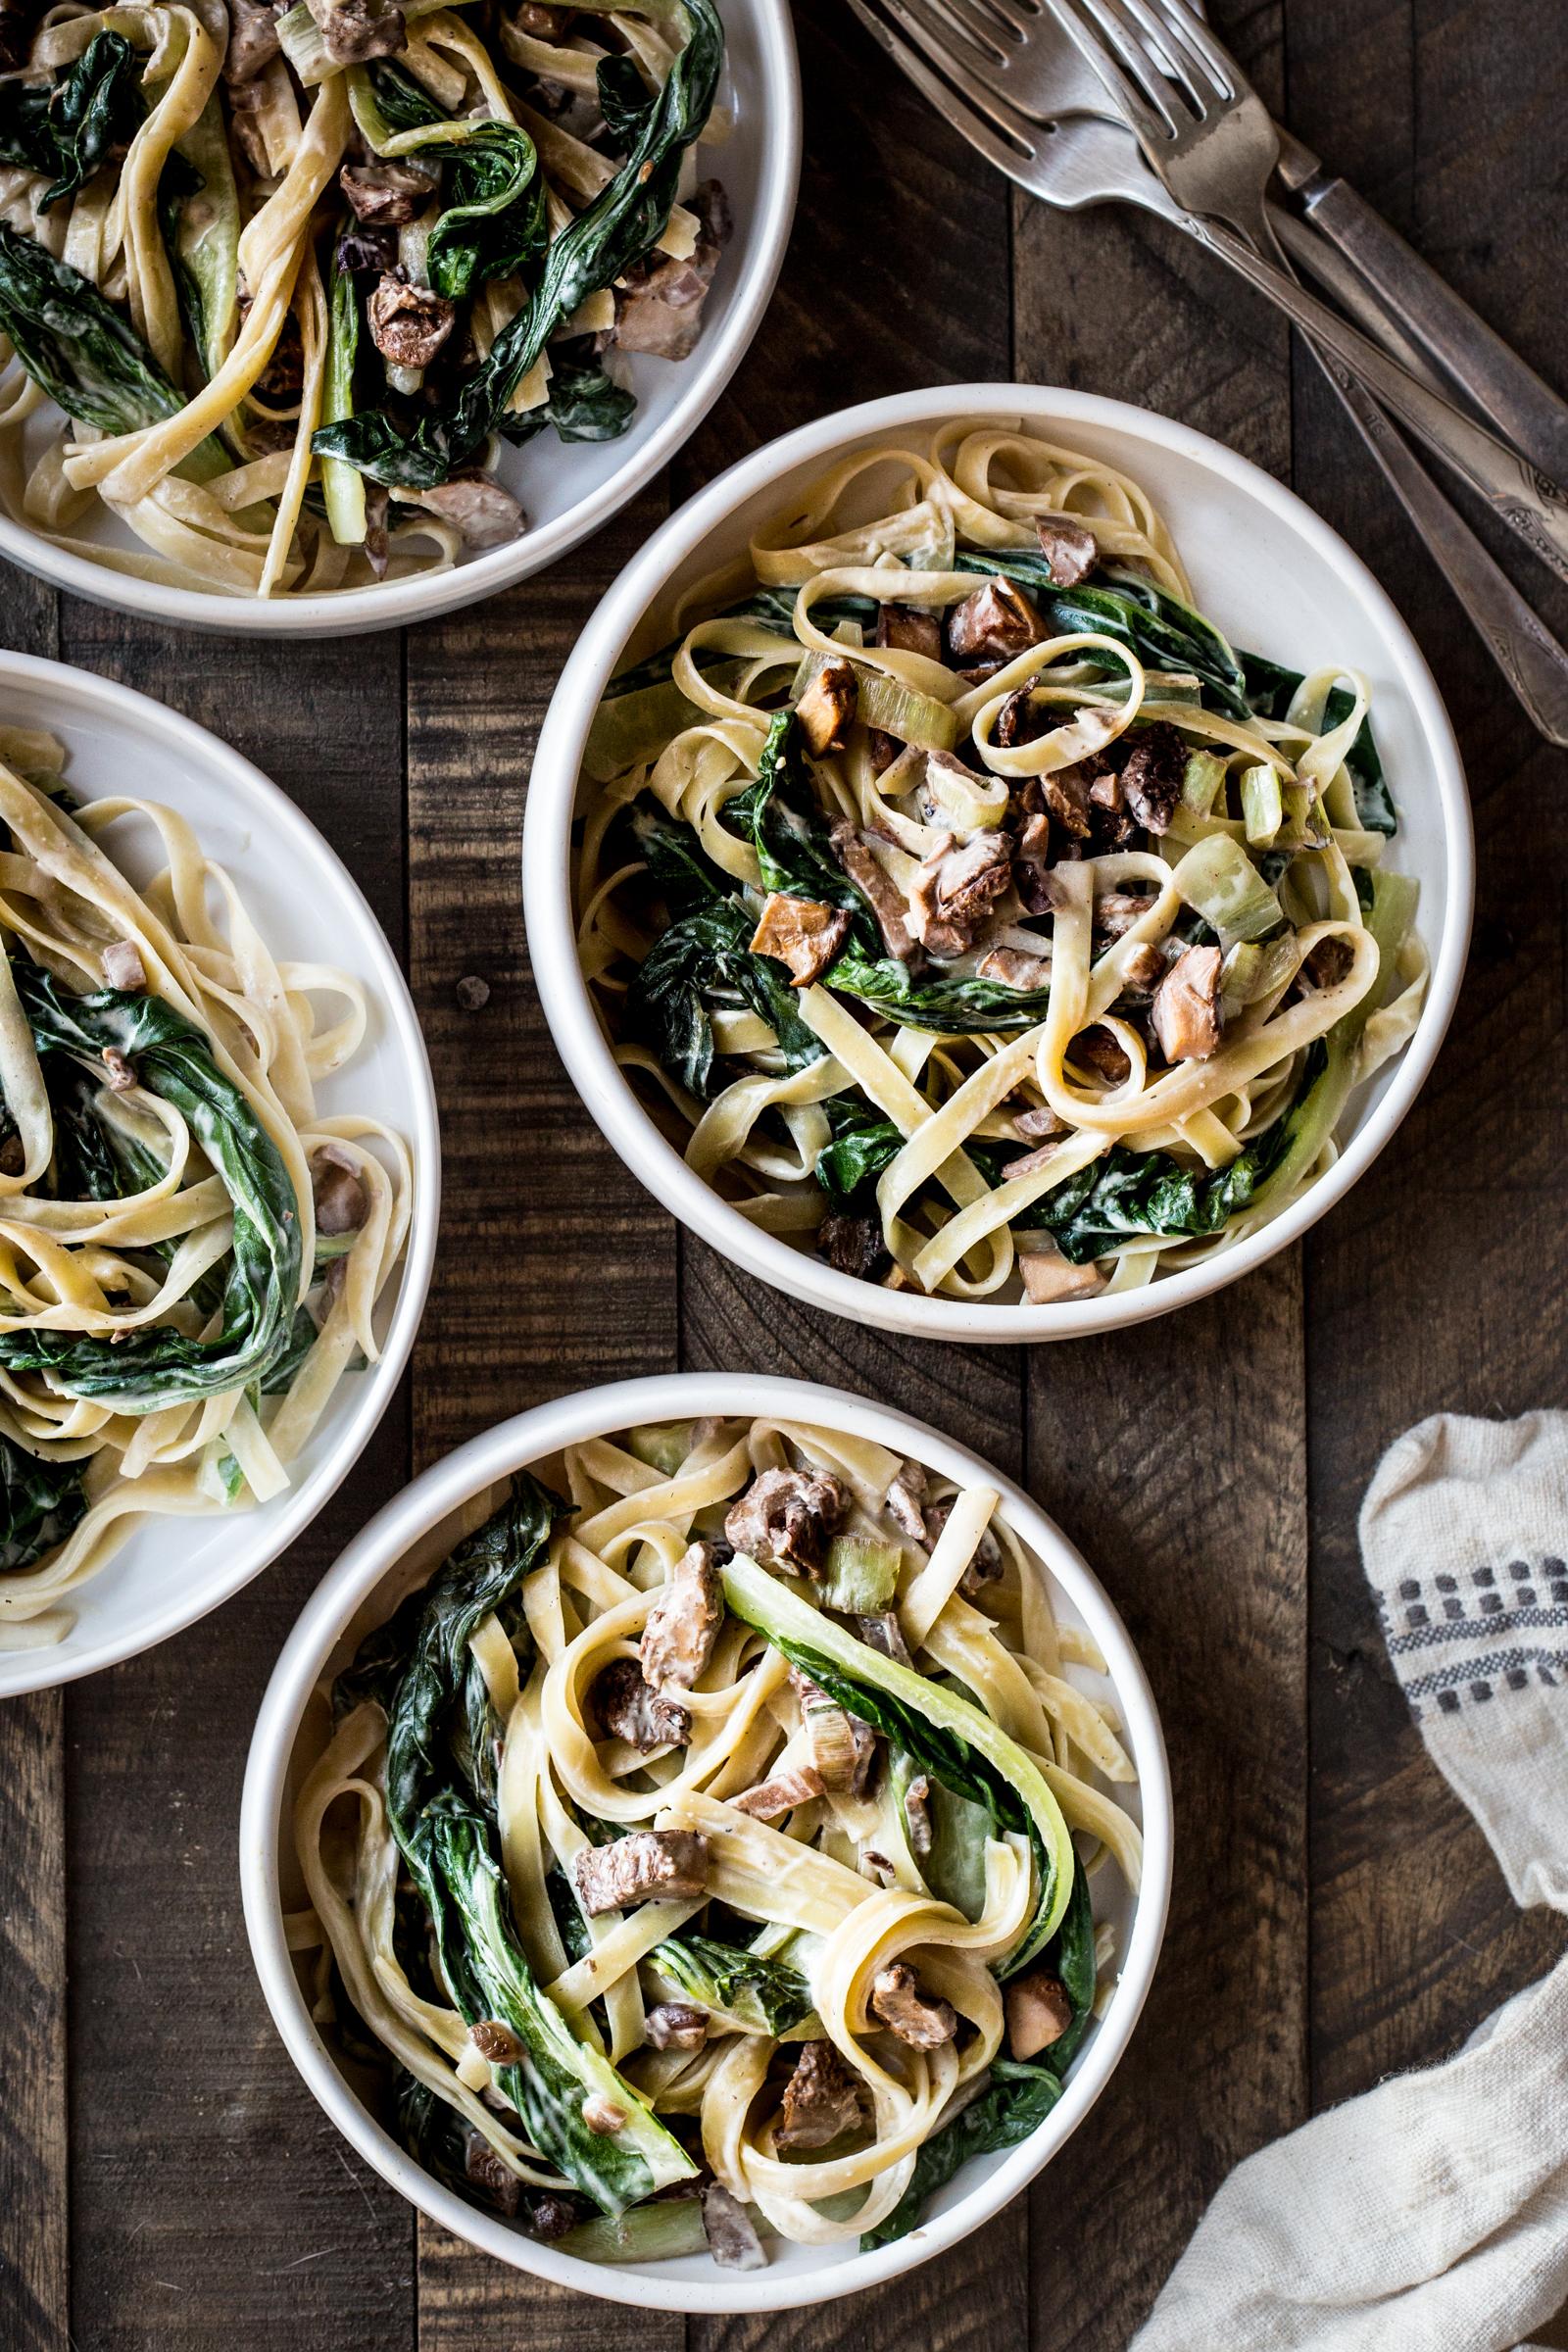 Wild Mushroom & Bok Choy Pasta with Cashew-Miso Sauce